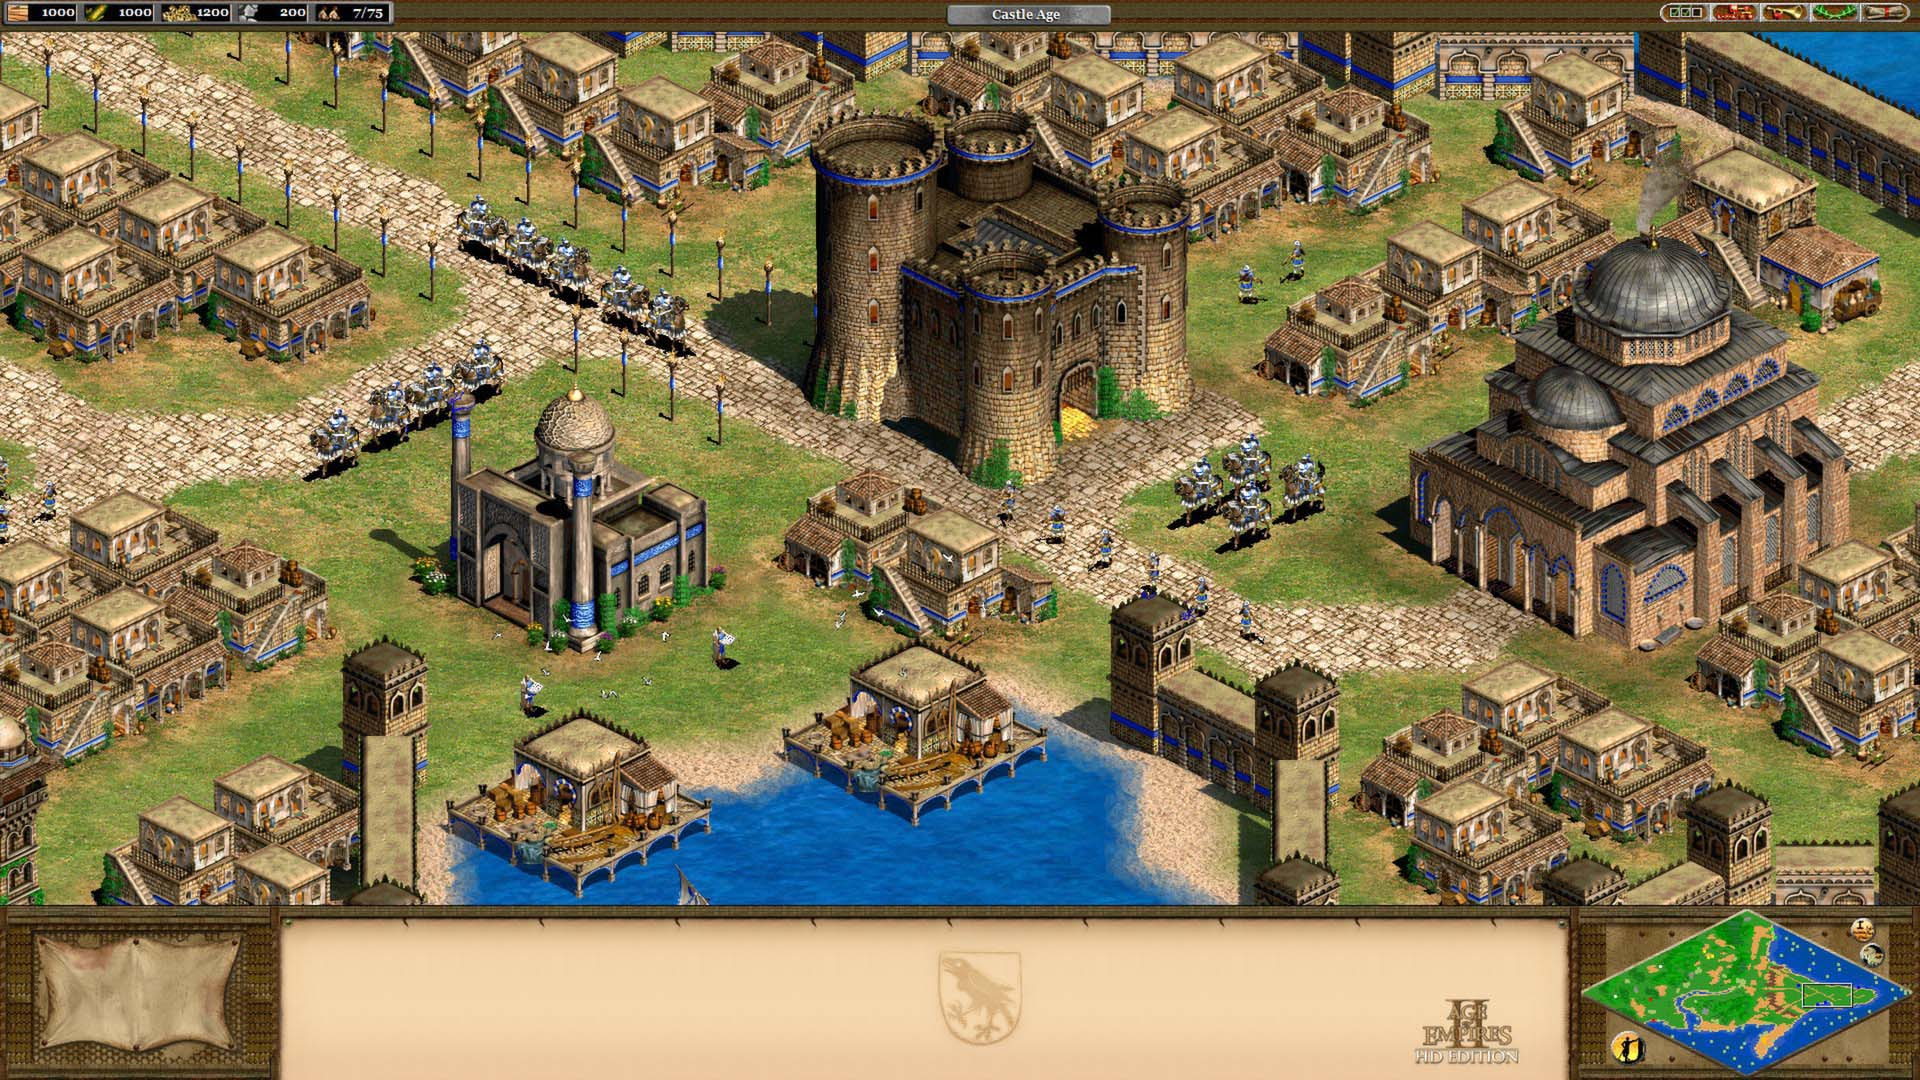 Age Of Empires wallpaper HD